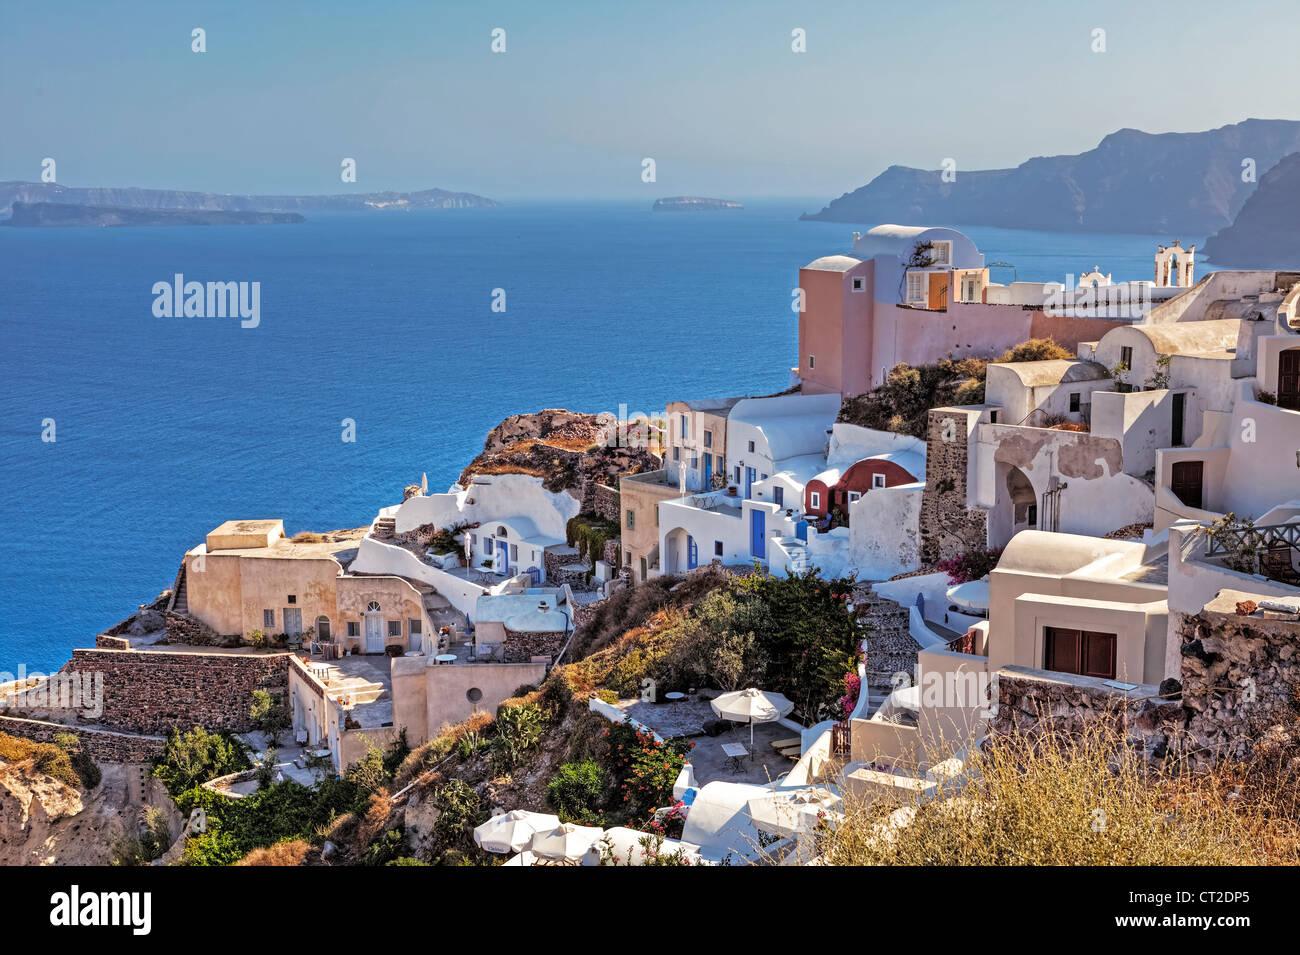 Oia, Santorini, Greece - Stock Image